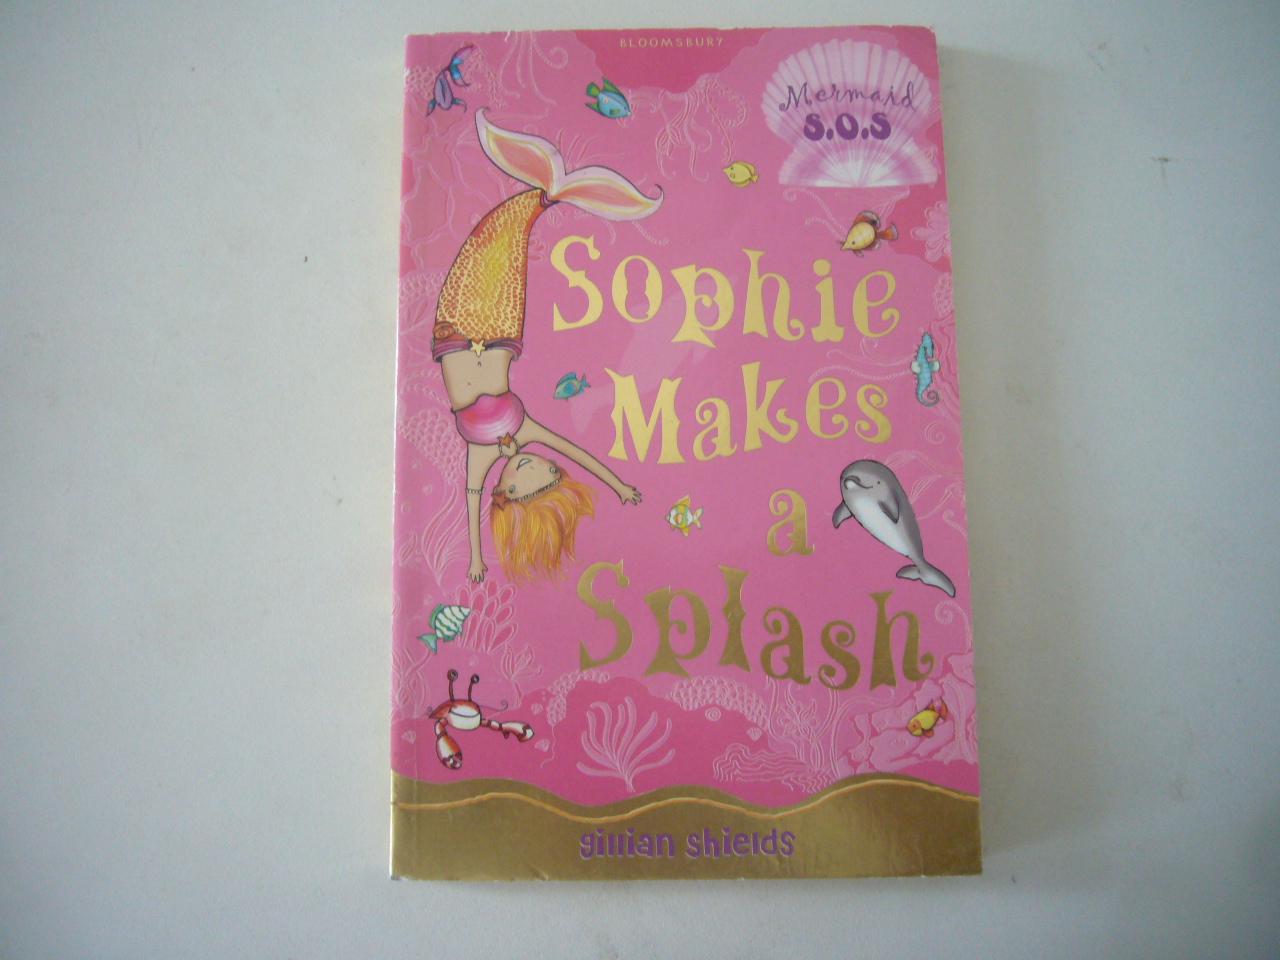 Mermaid S.O.S. 3: Sophie Makes a Splash